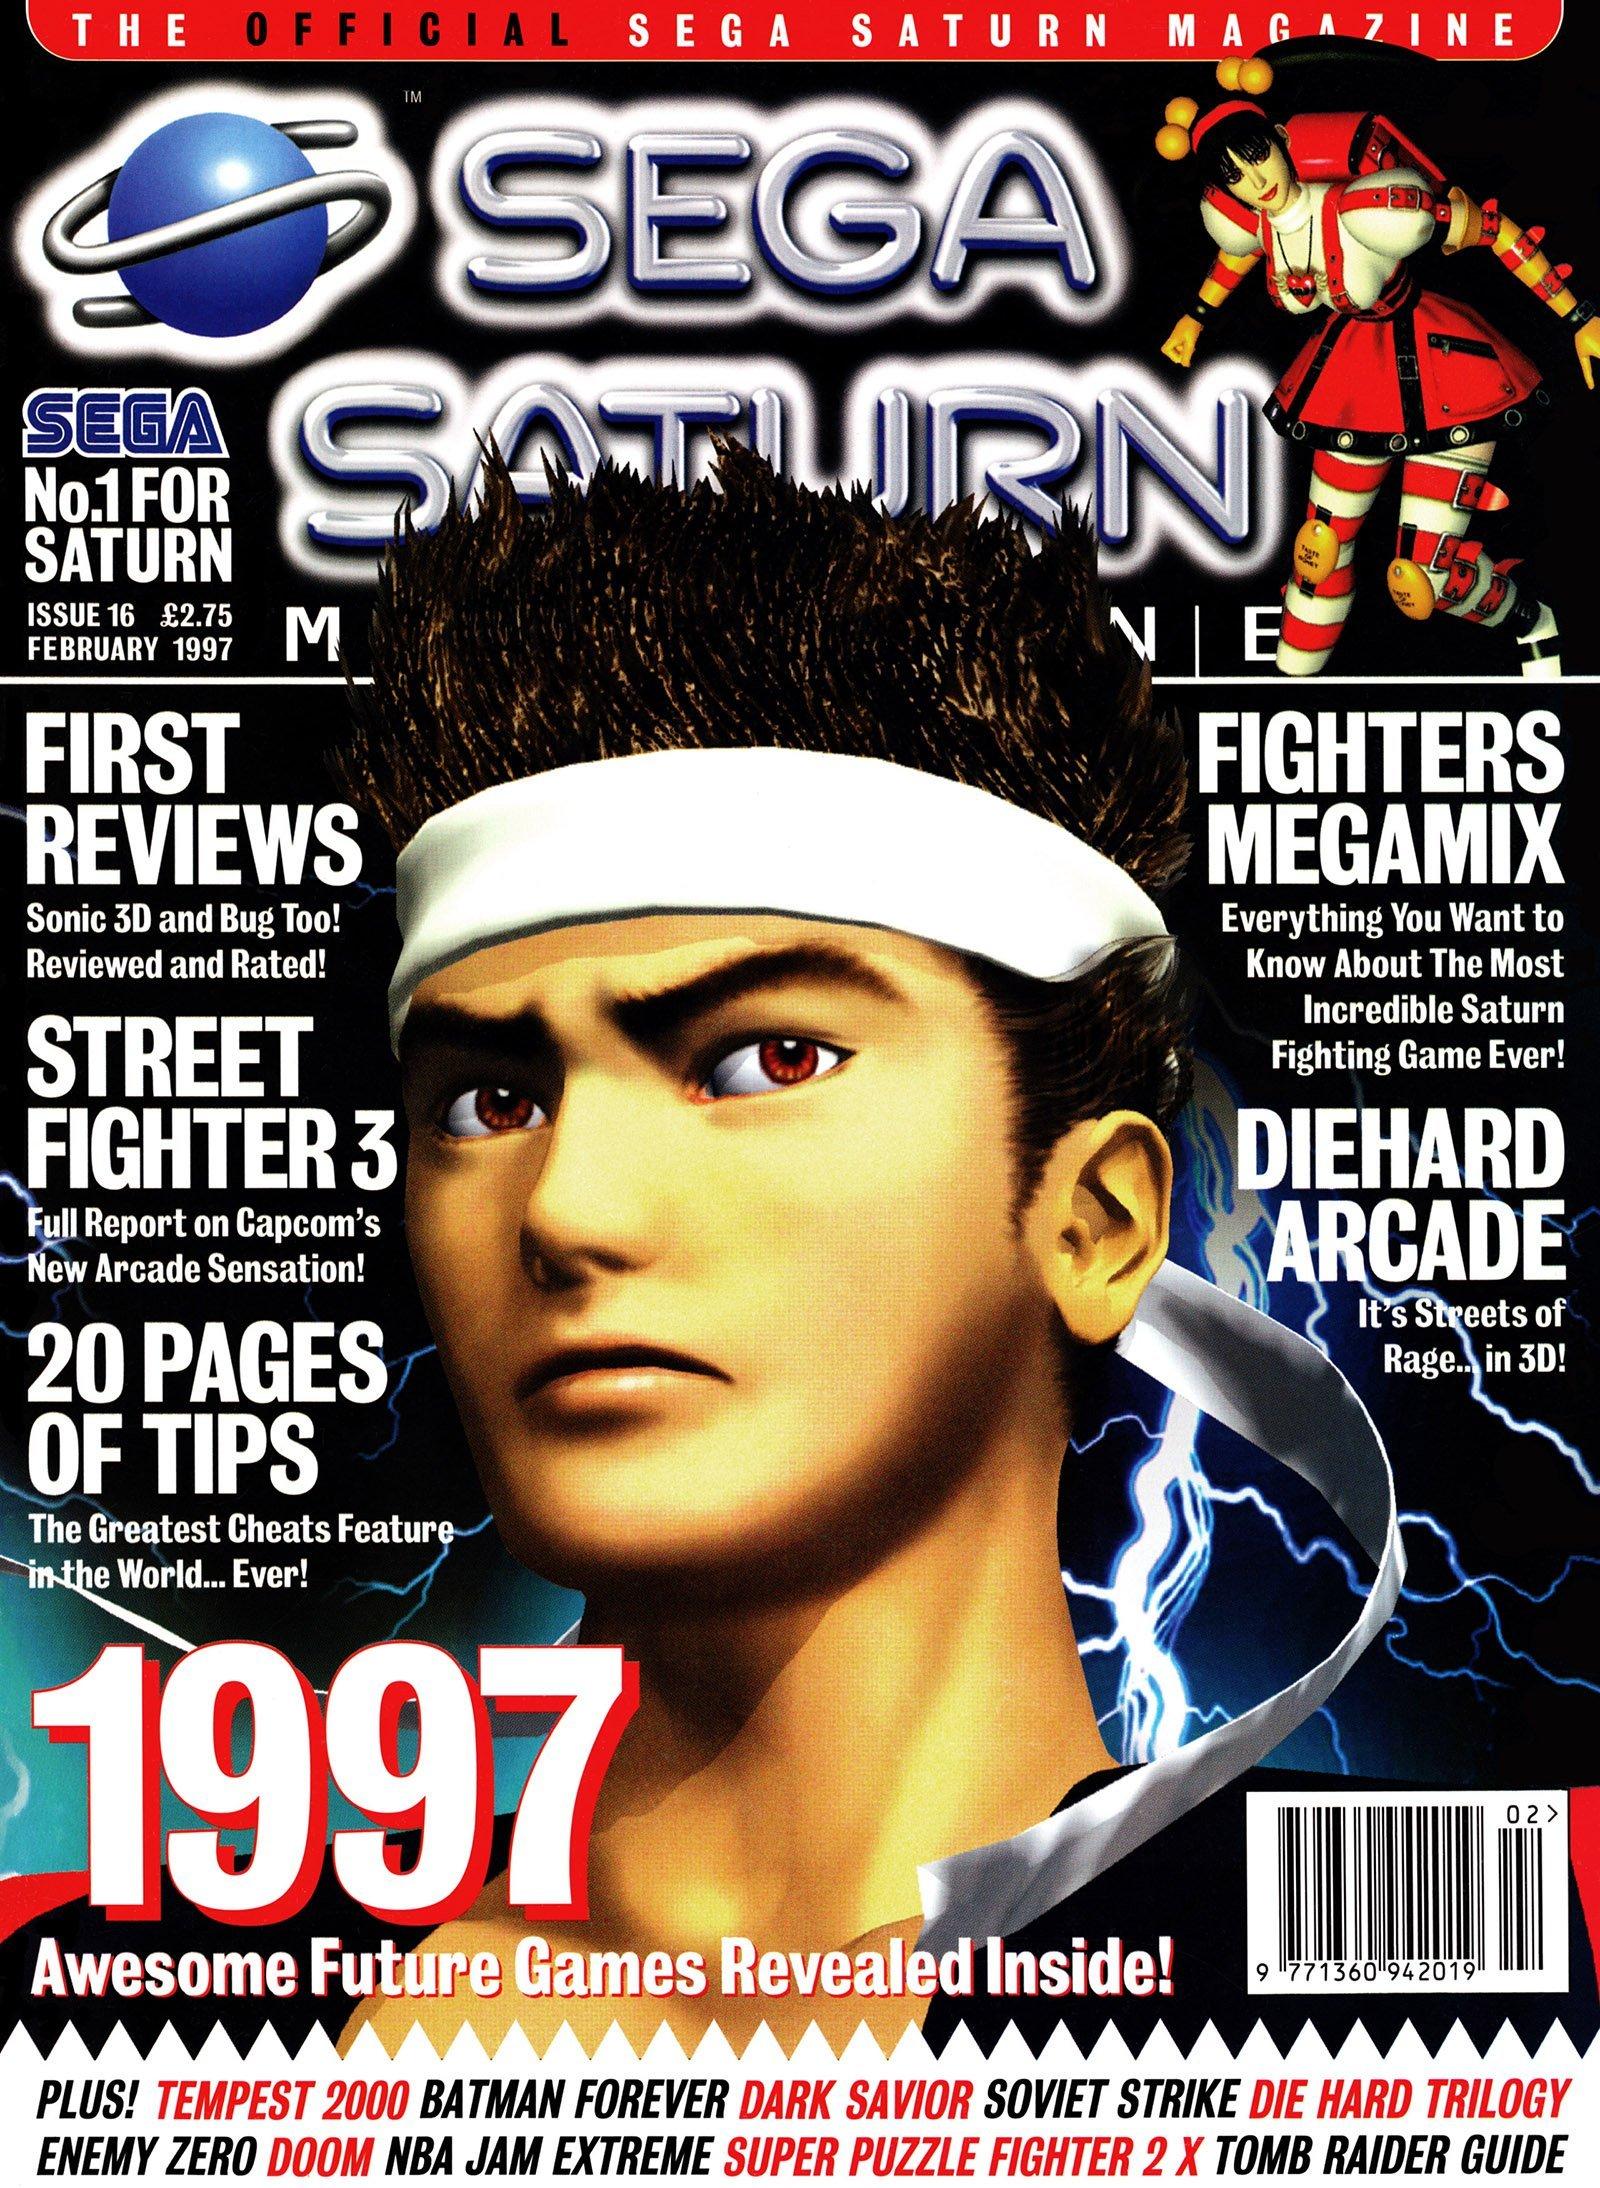 Official Sega Saturn Magazine 16 (February 1997)